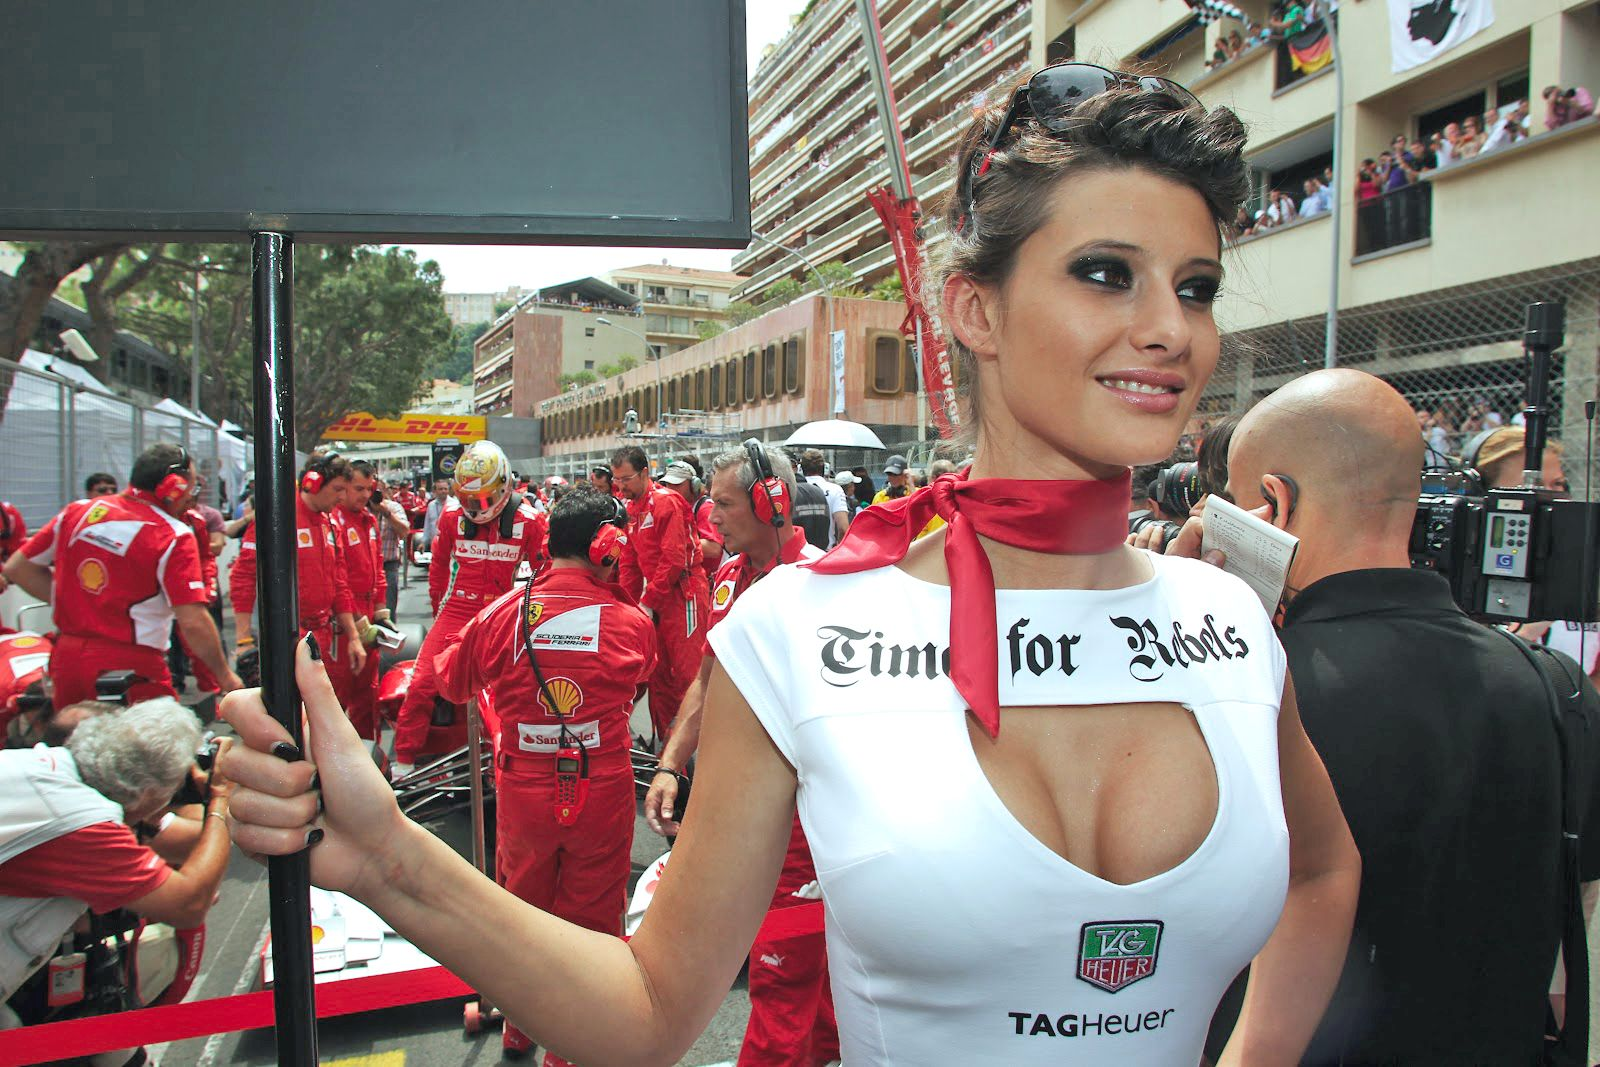 adore Italienisch Mature Bbw intelligent, well-read, and very